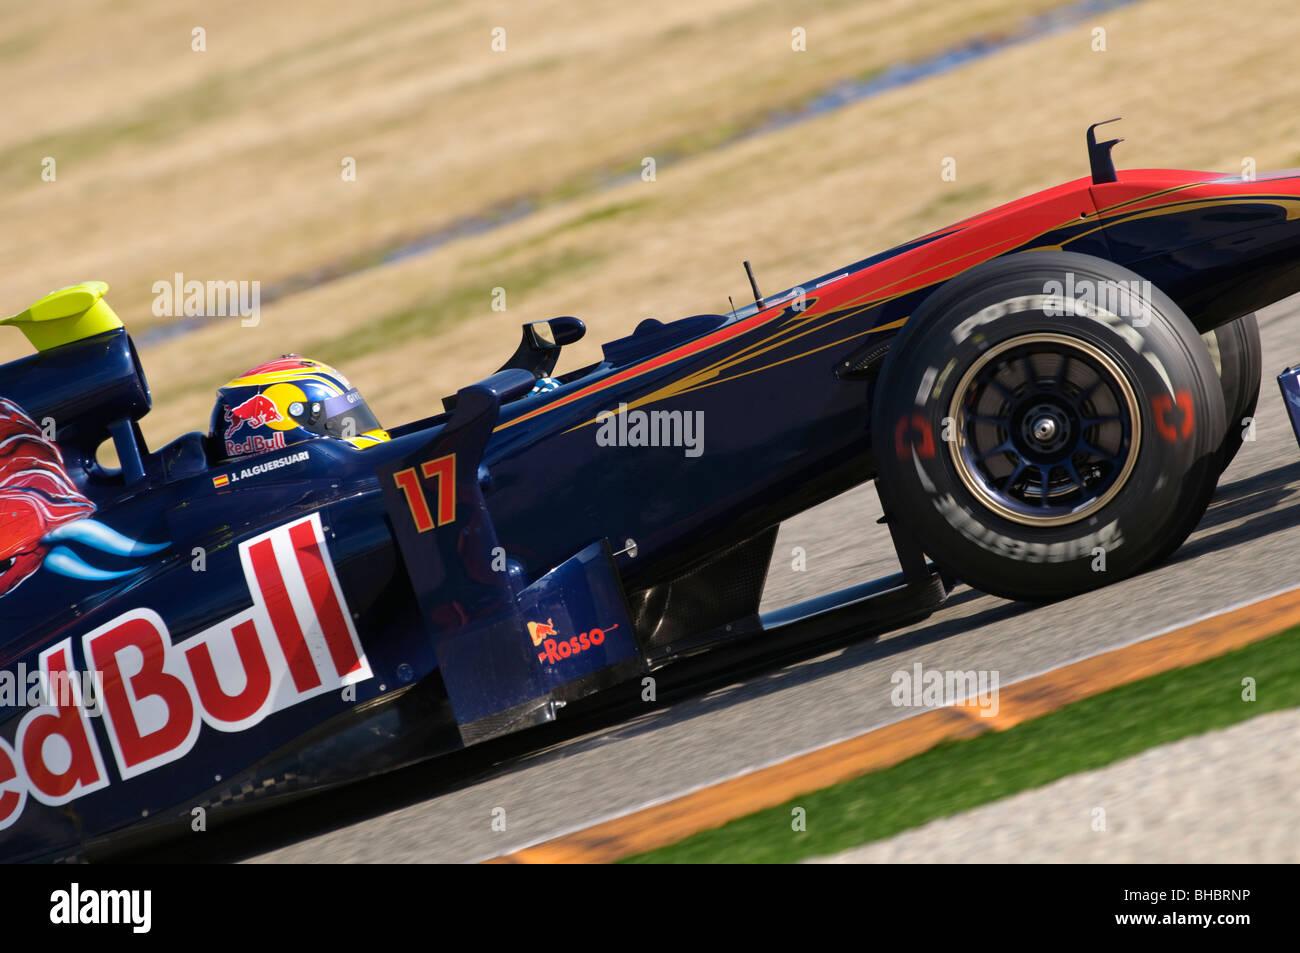 Jaime ALGUERSUARI (ESP), Scuderia Toro Rosso, driving the STR4 Formula One racing car in February 2010 - Stock Image